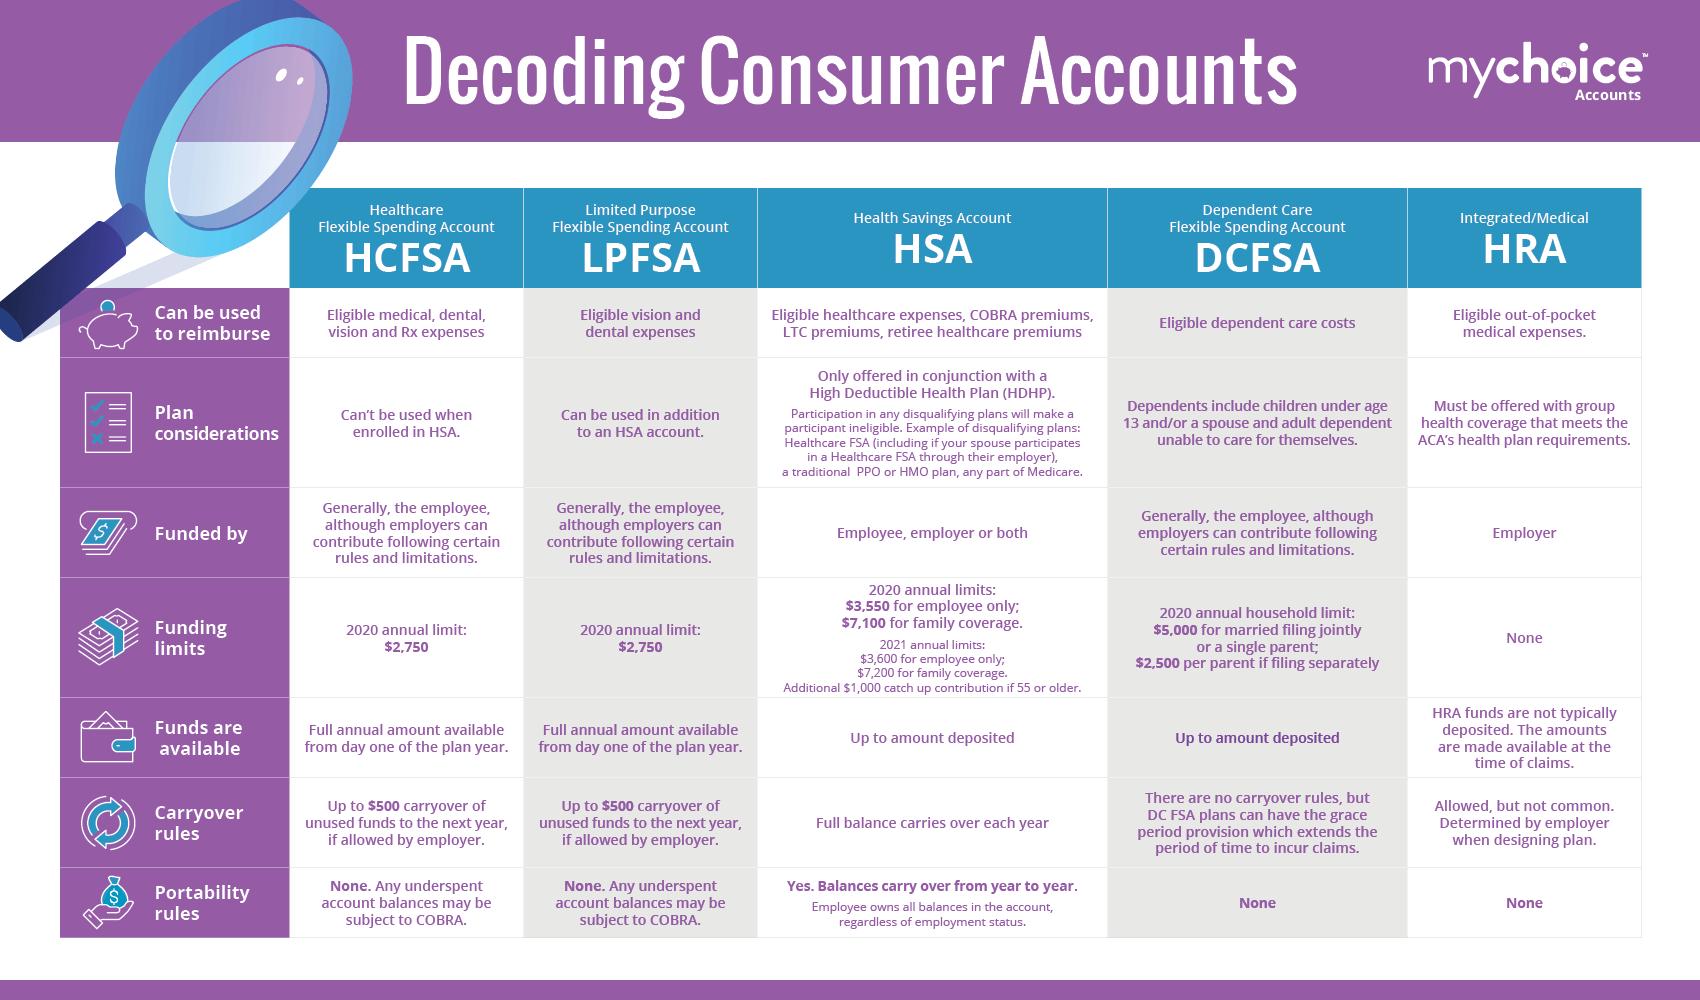 lp-img-MCA-decoding-consumer-accounts